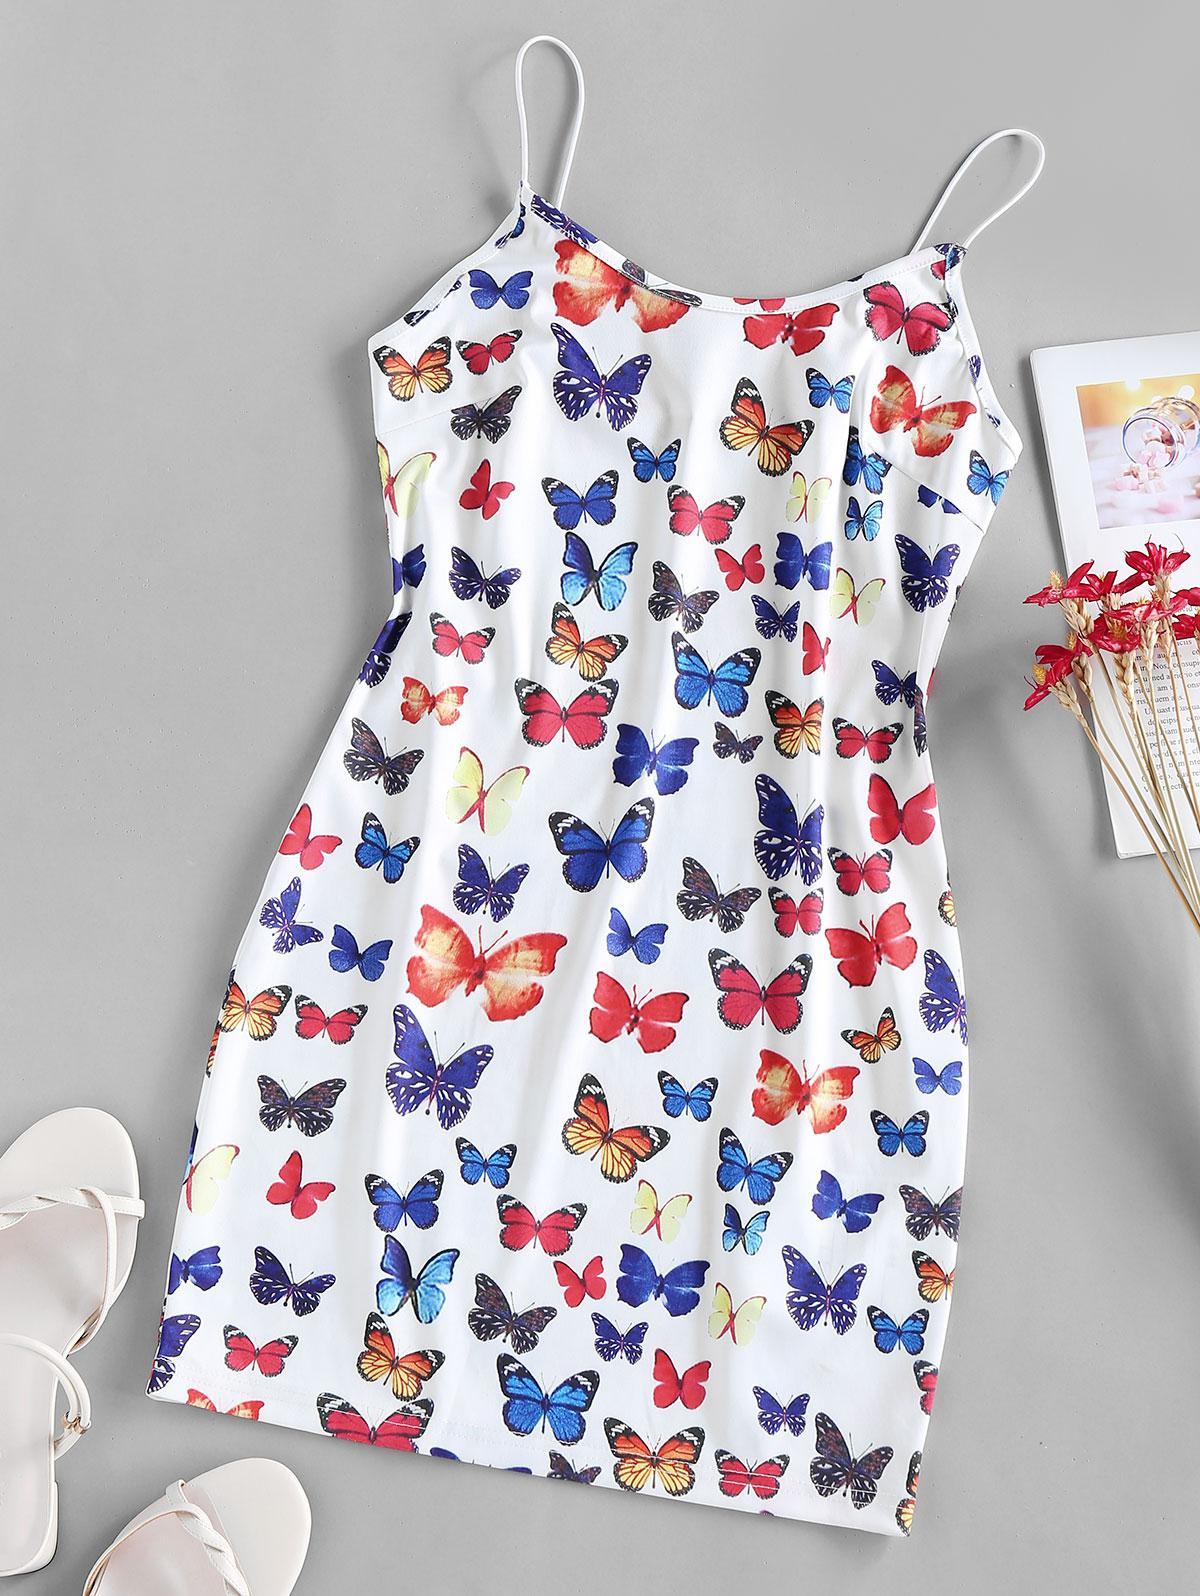 ZAFUL Cami Butterfly Print Backless Bodycon Dress